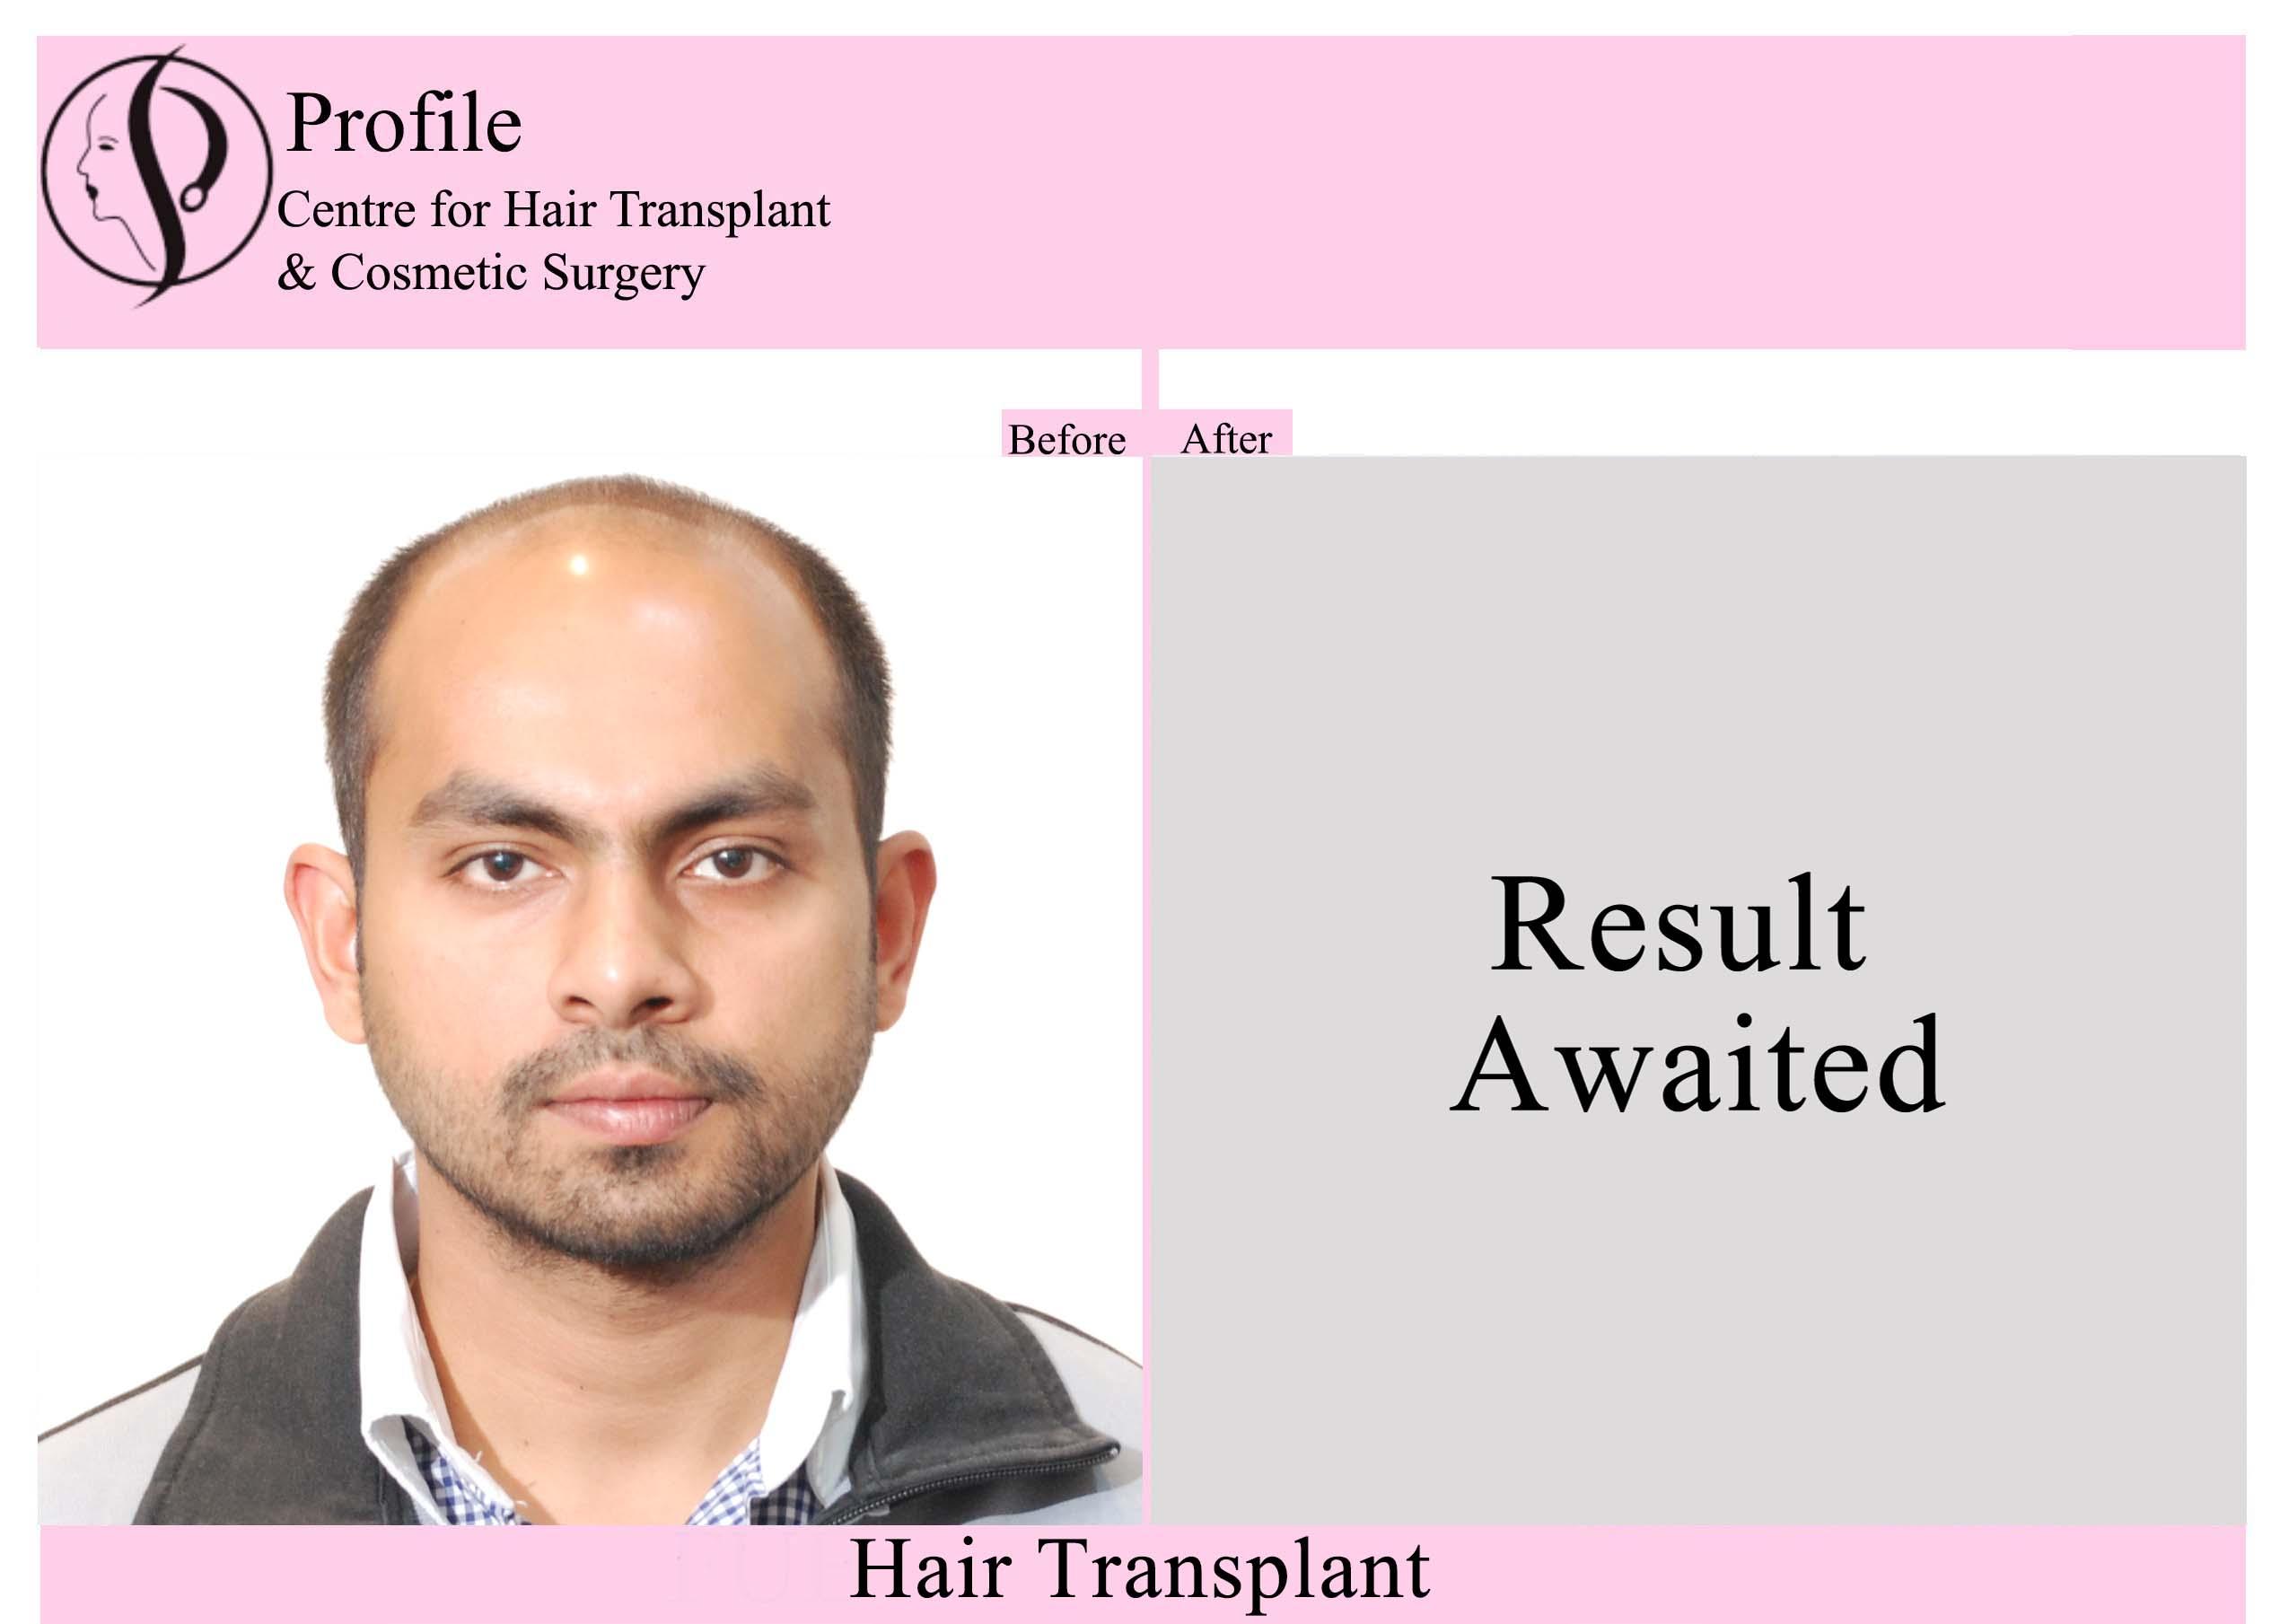 Dr. Sahil Garg